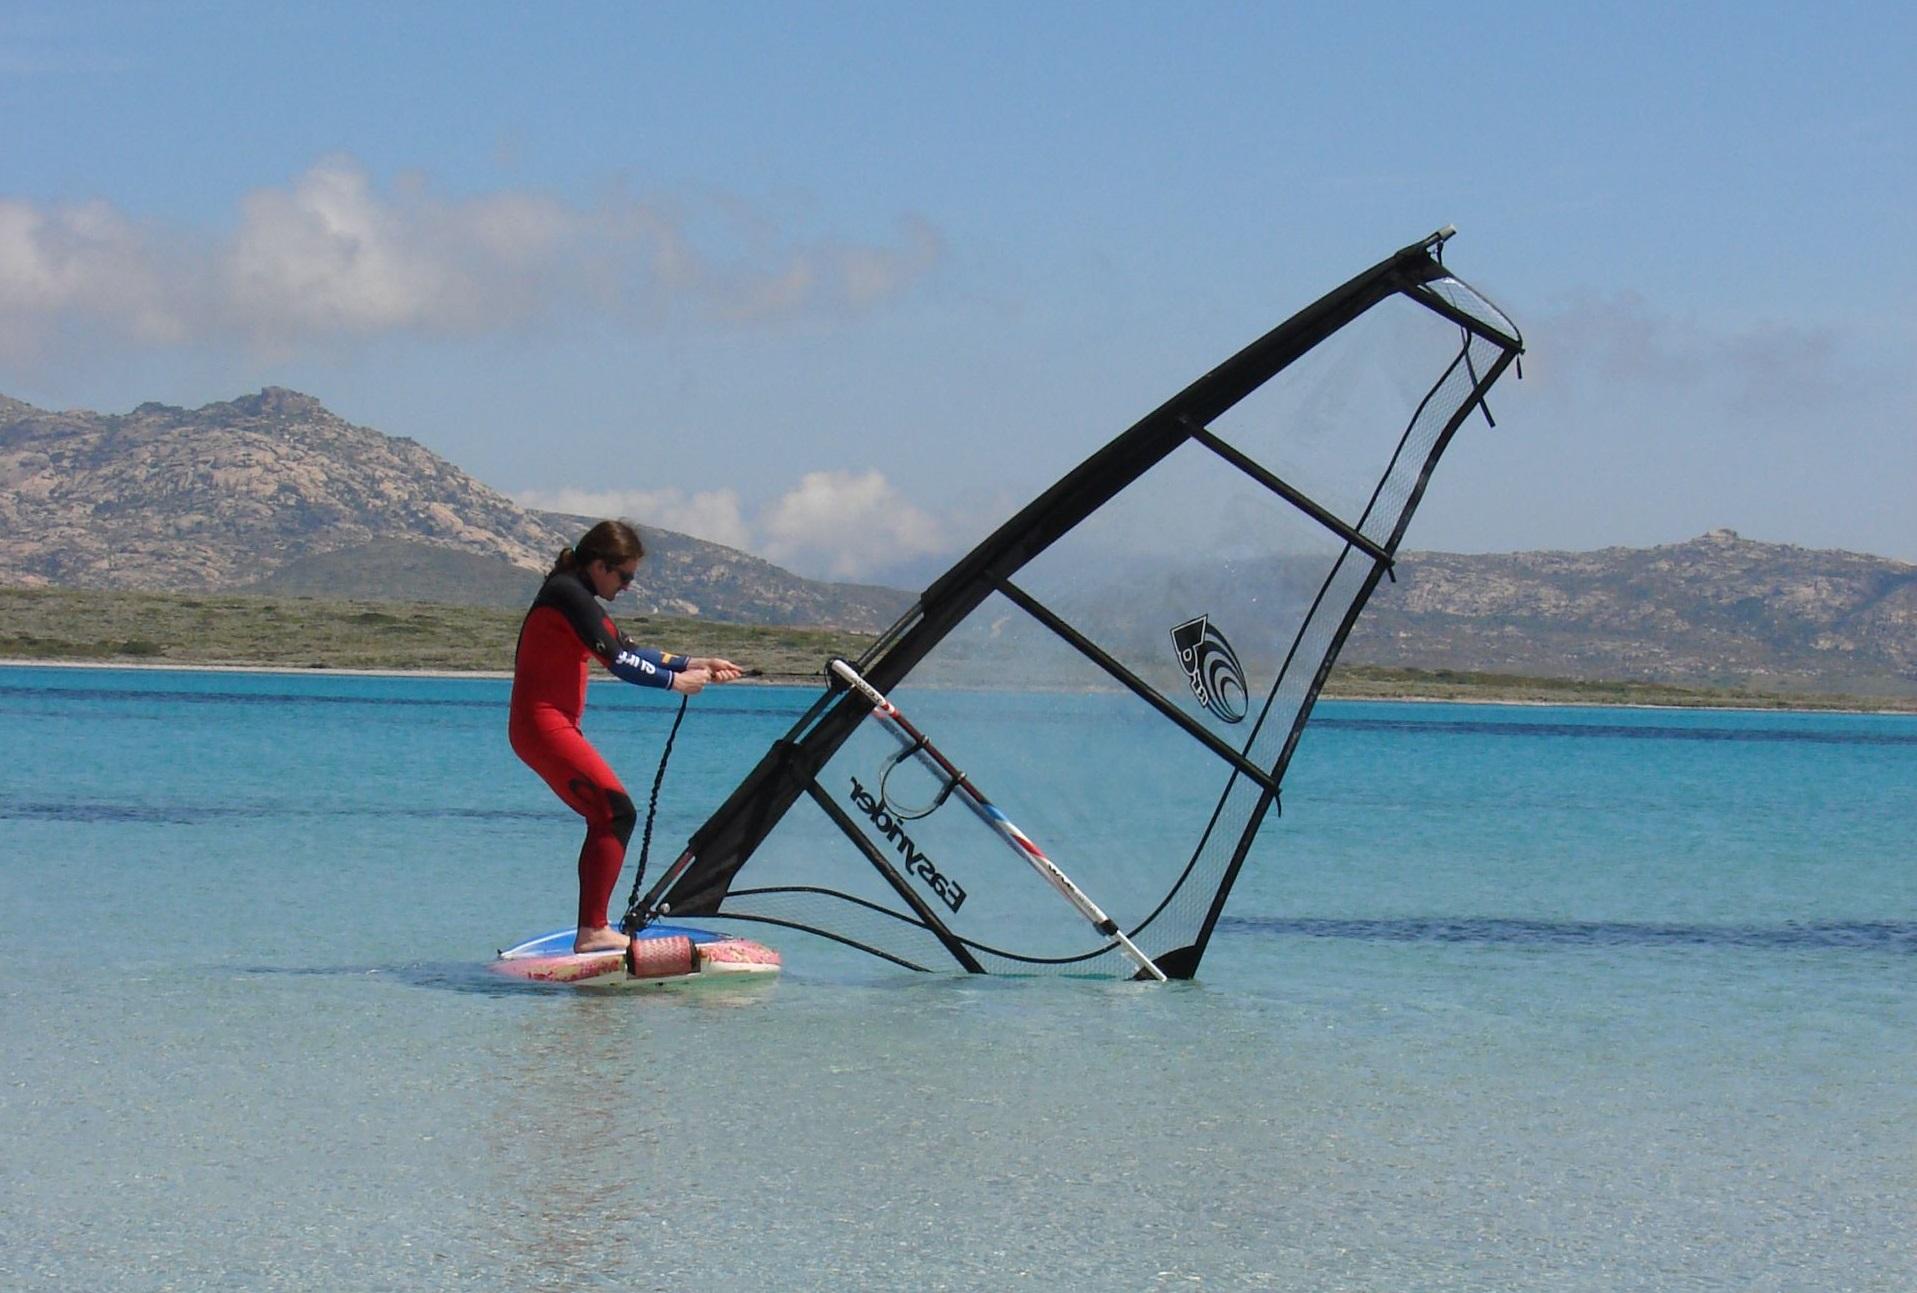 initiation au windsurf en sardaigne. Black Bedroom Furniture Sets. Home Design Ideas